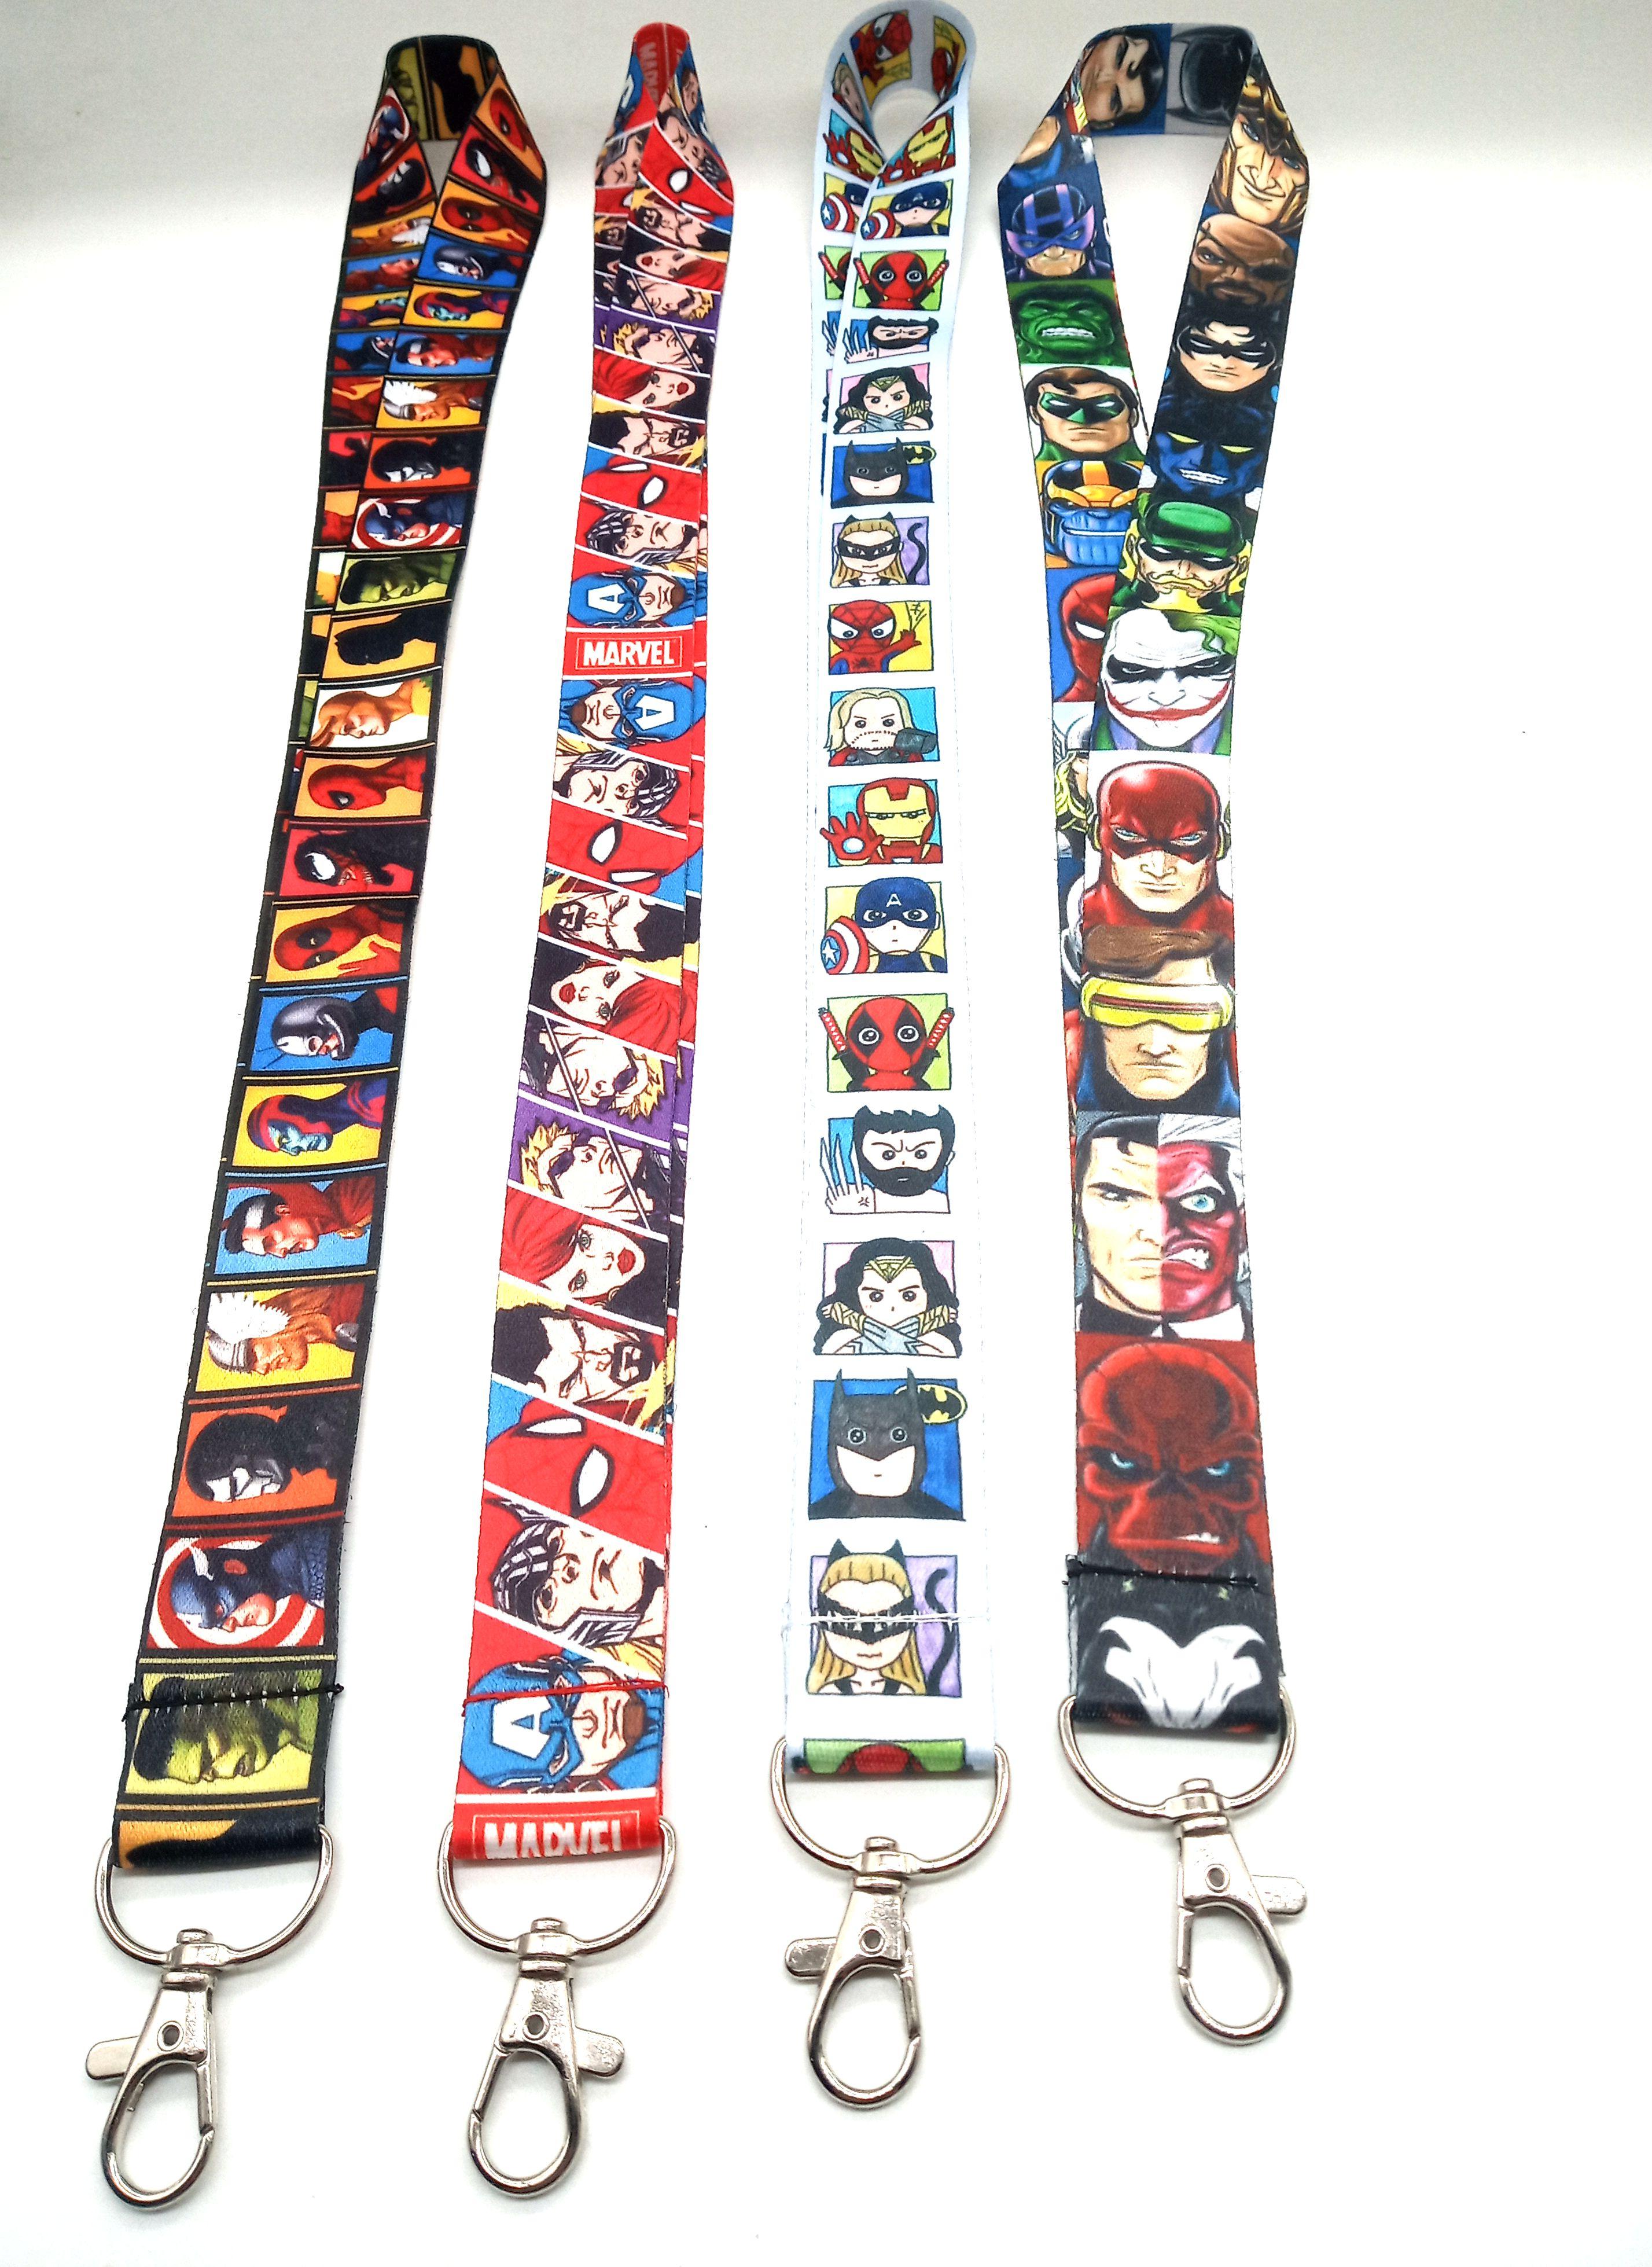 10pcs cartoon stitch Neck Strap Lanyard Key chain Phone Card Badge Holder